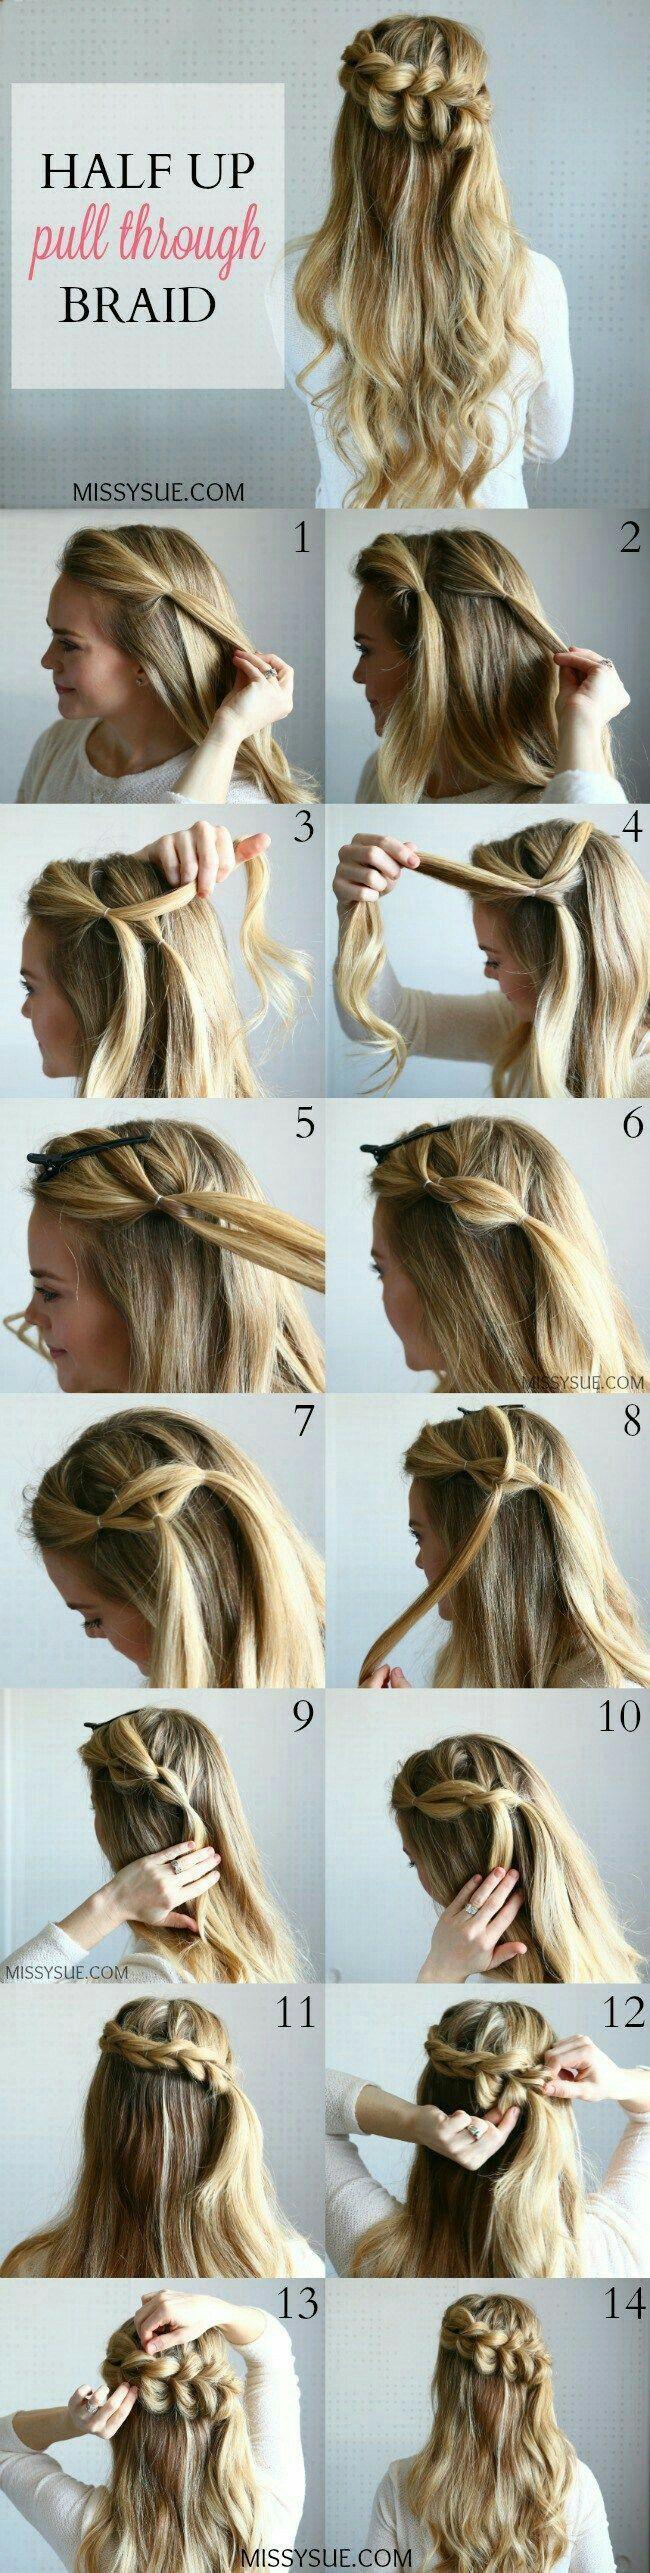 Hairstyle step by step. . Braid